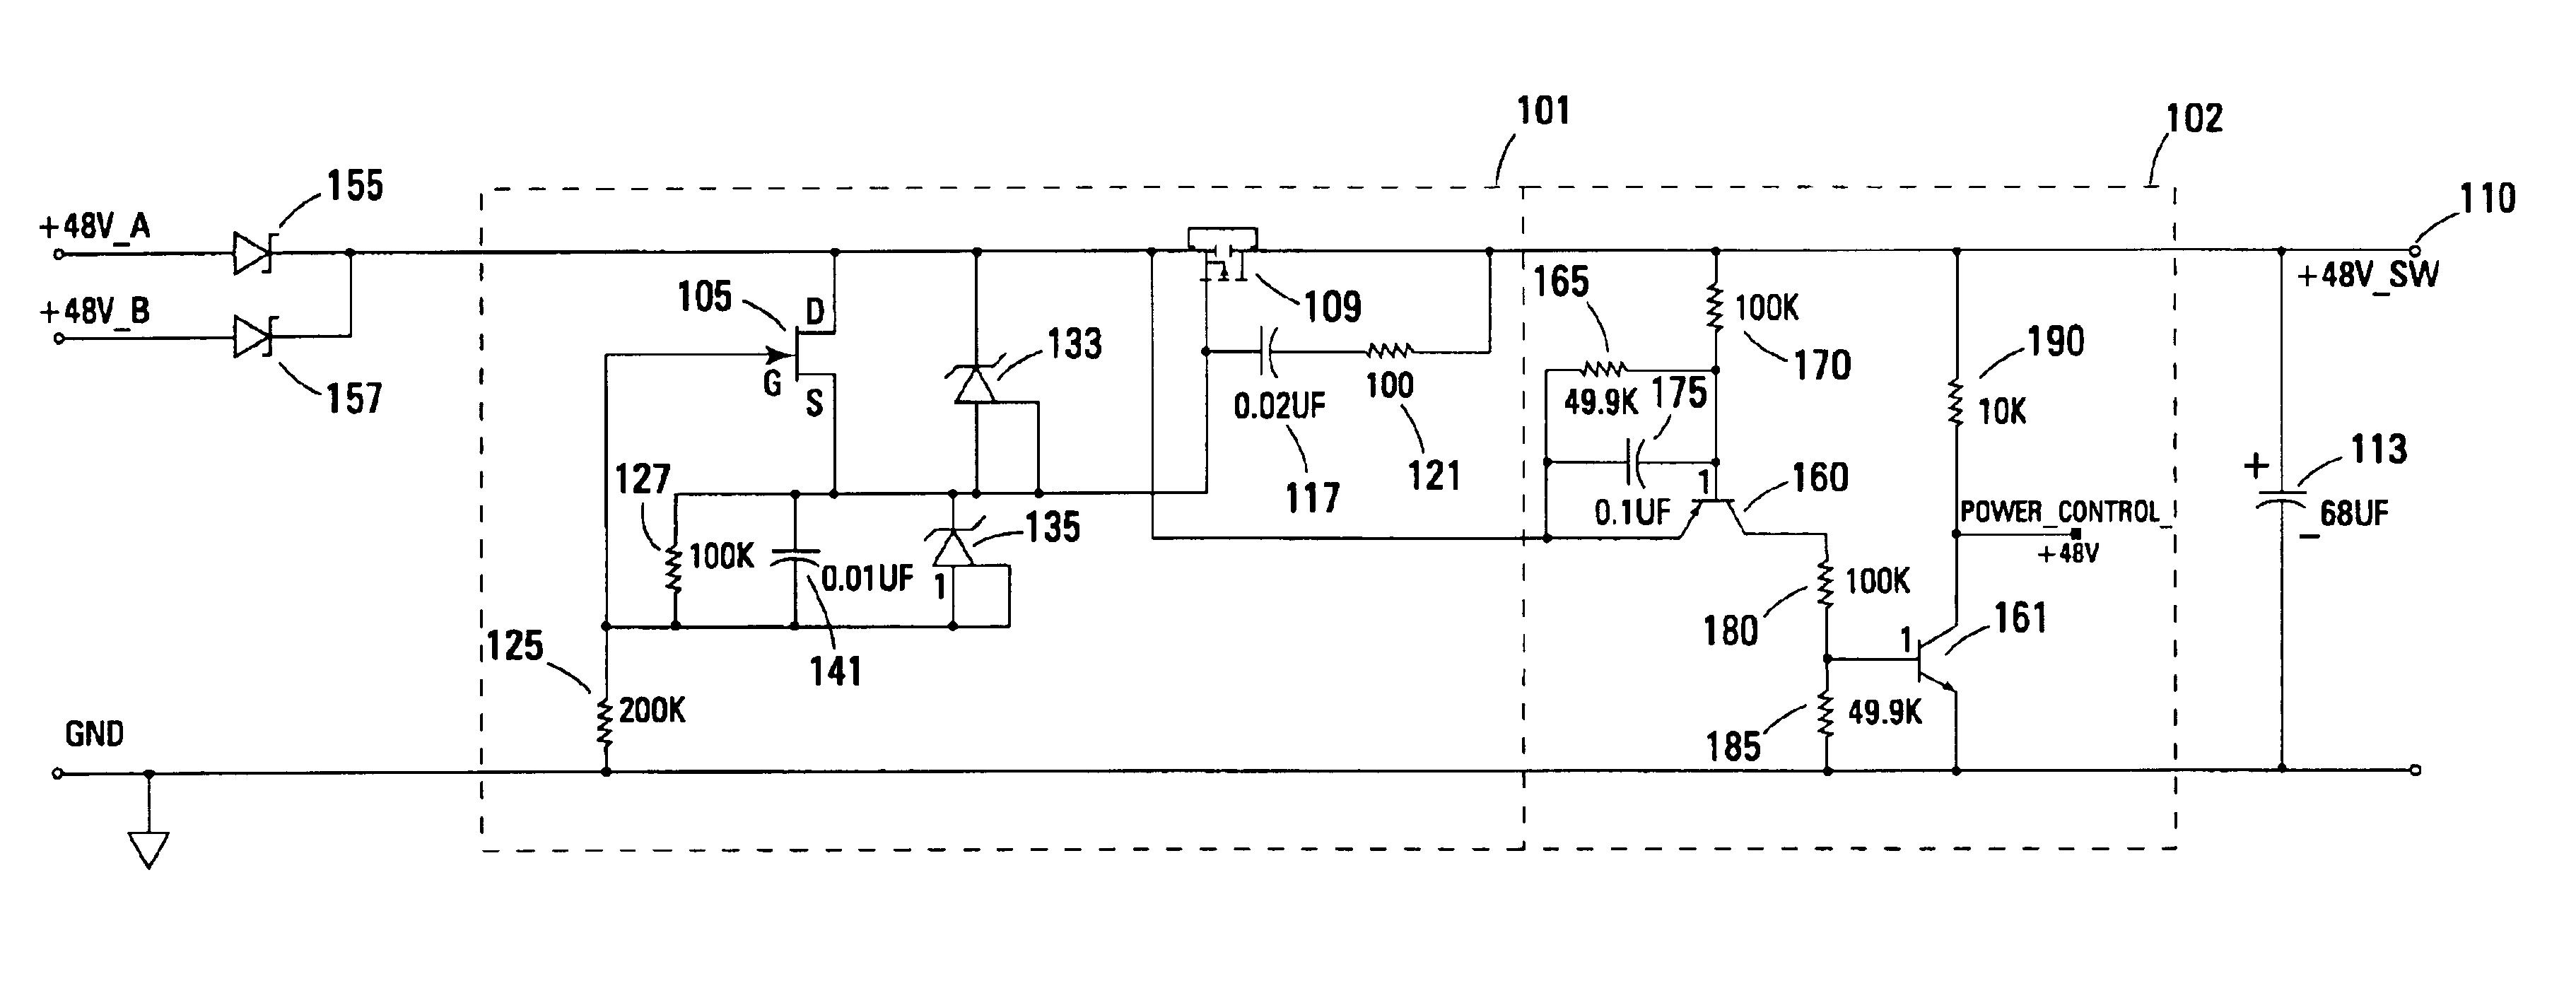 patent us6807039 - inrush limiter circuit